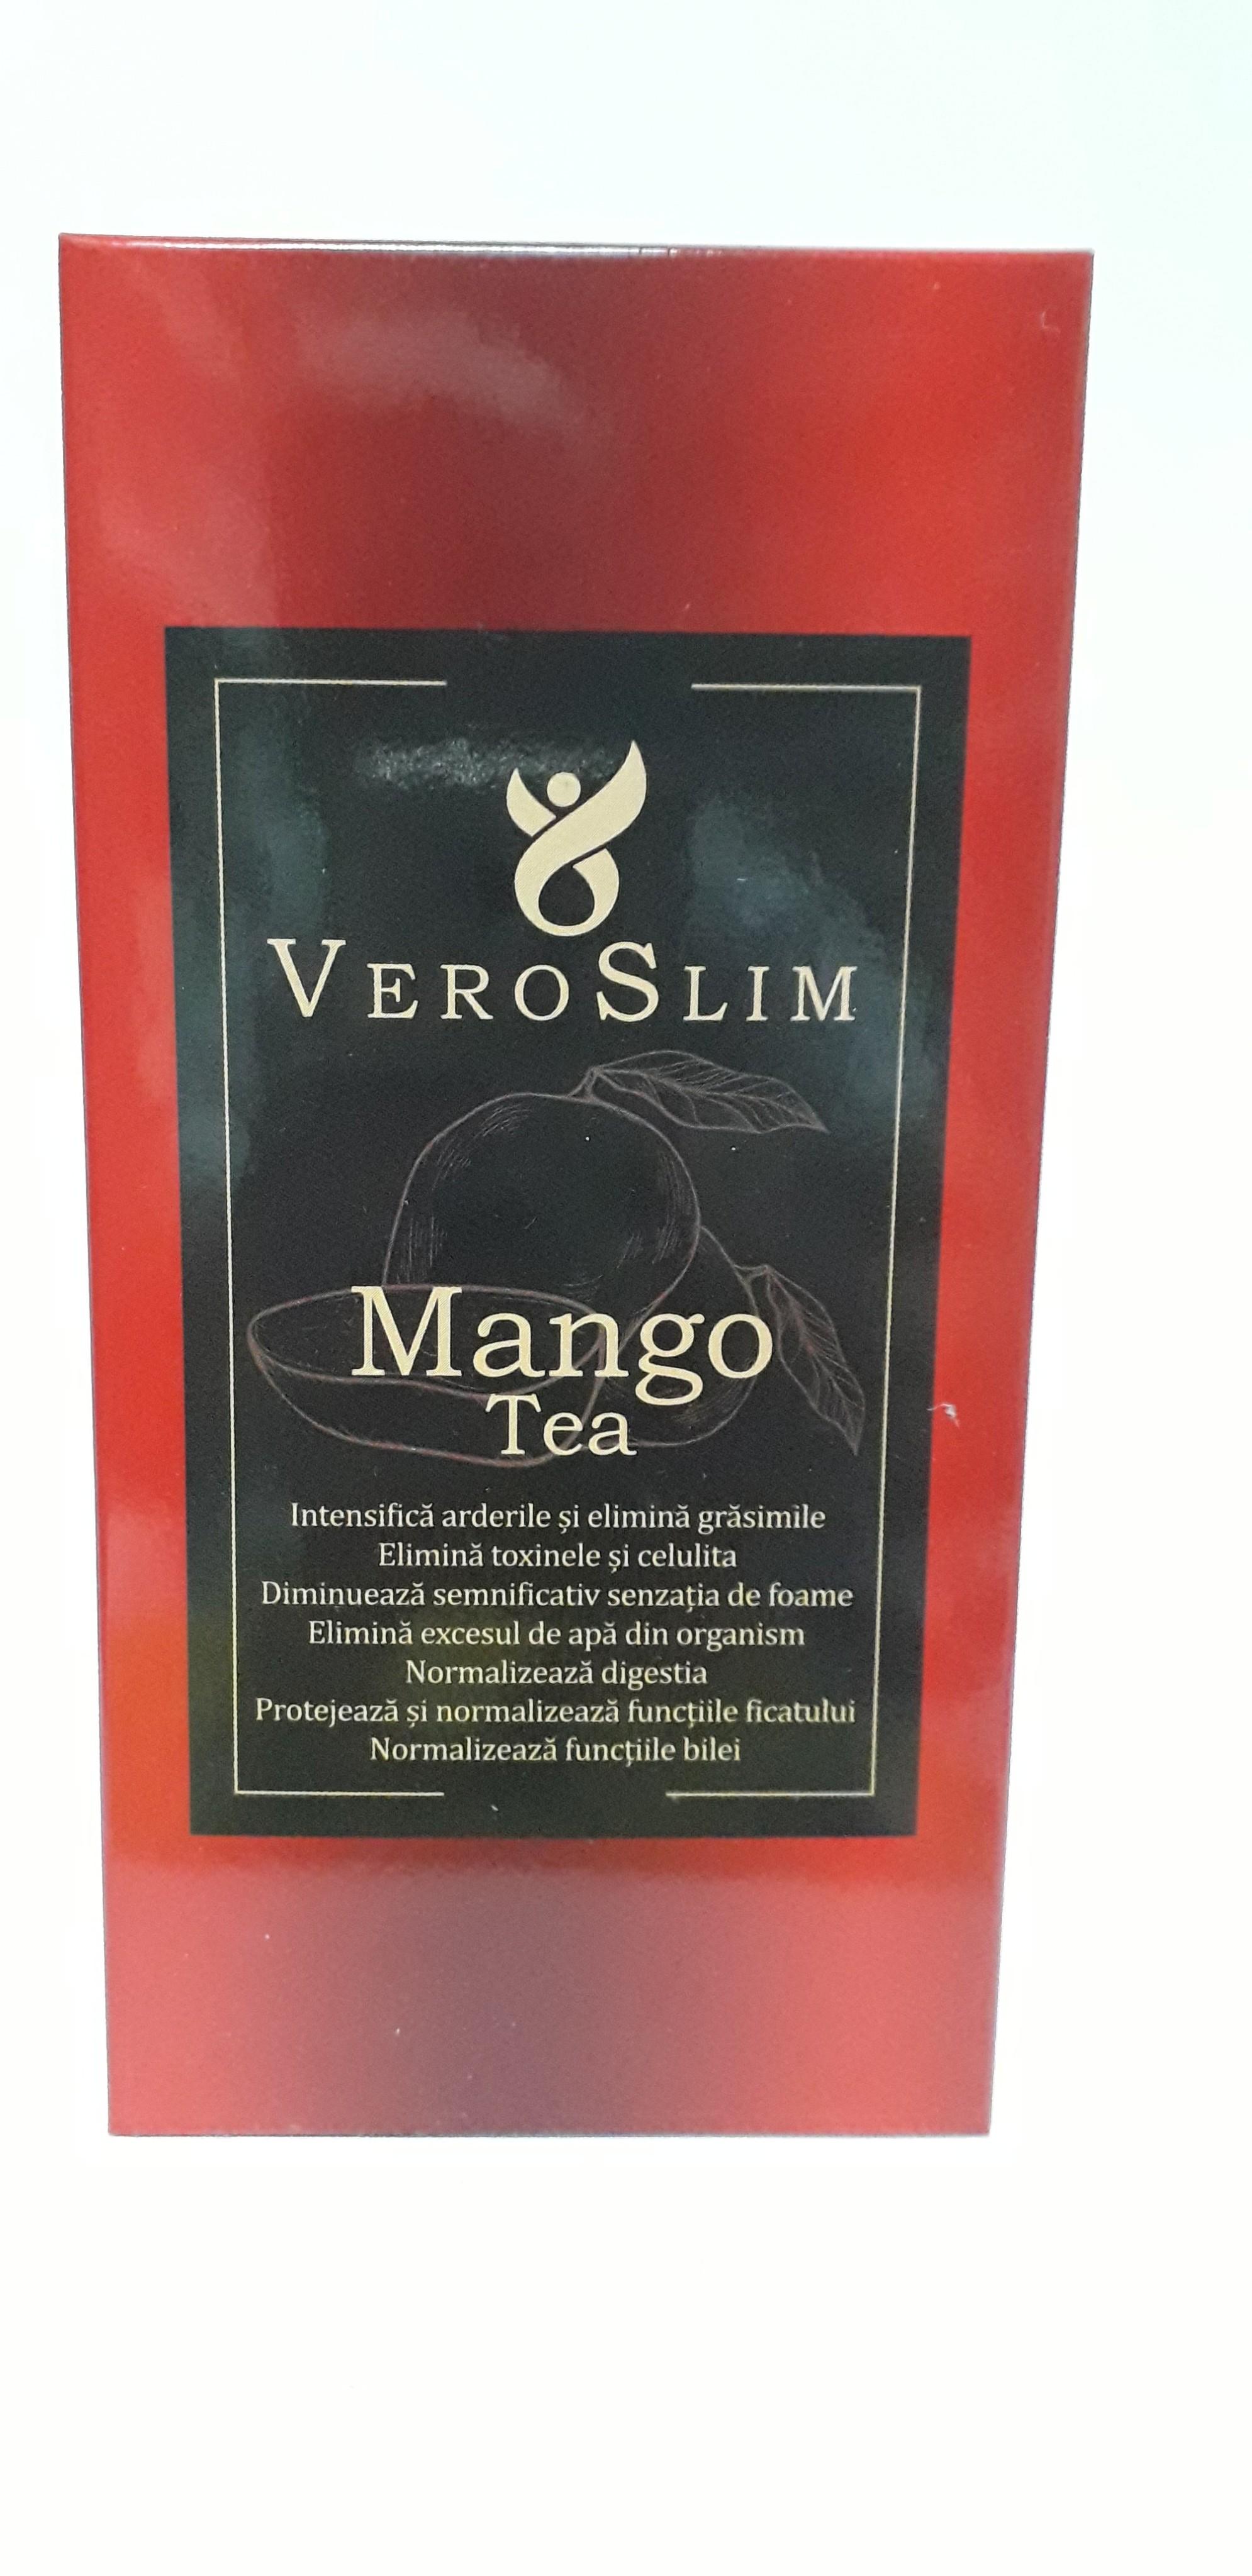 Ceaiul care te ajuta sa slabesti, in MOD NATURAL! - vortecs.ro